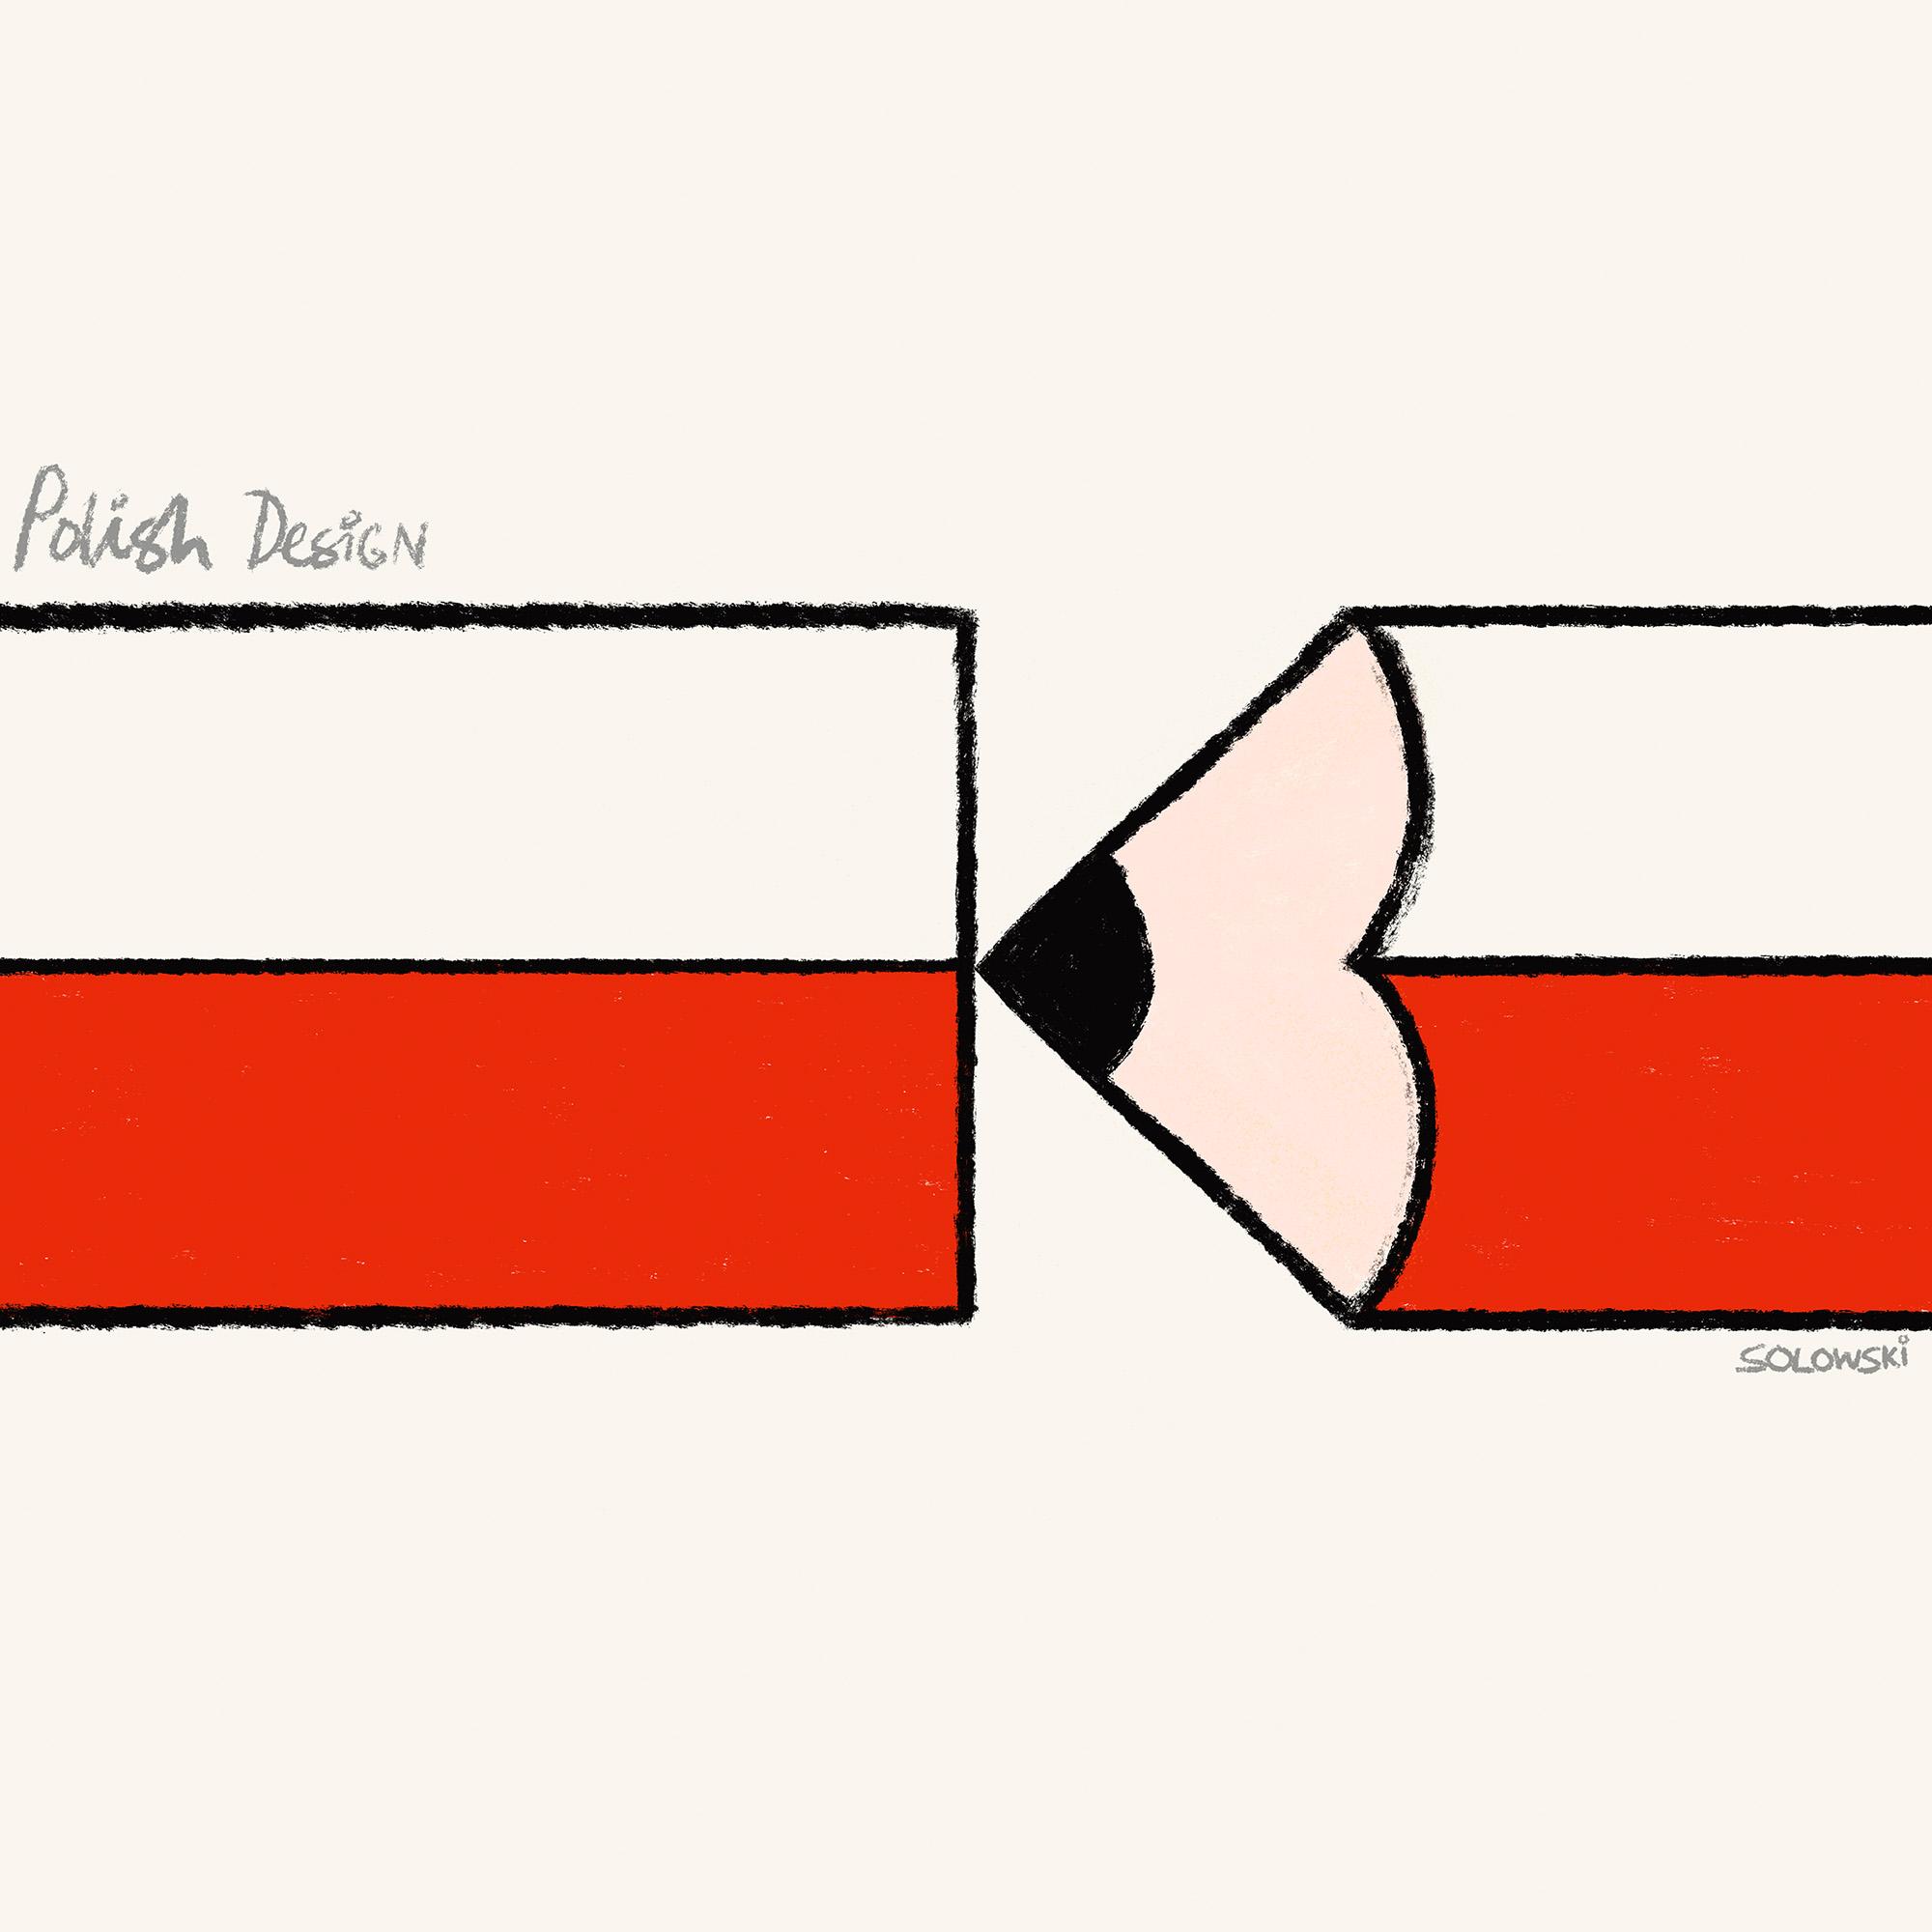 POLISH_DESIGN-SOLOWSKI-YOU_WANTED_A_LIST_2000px.jpg